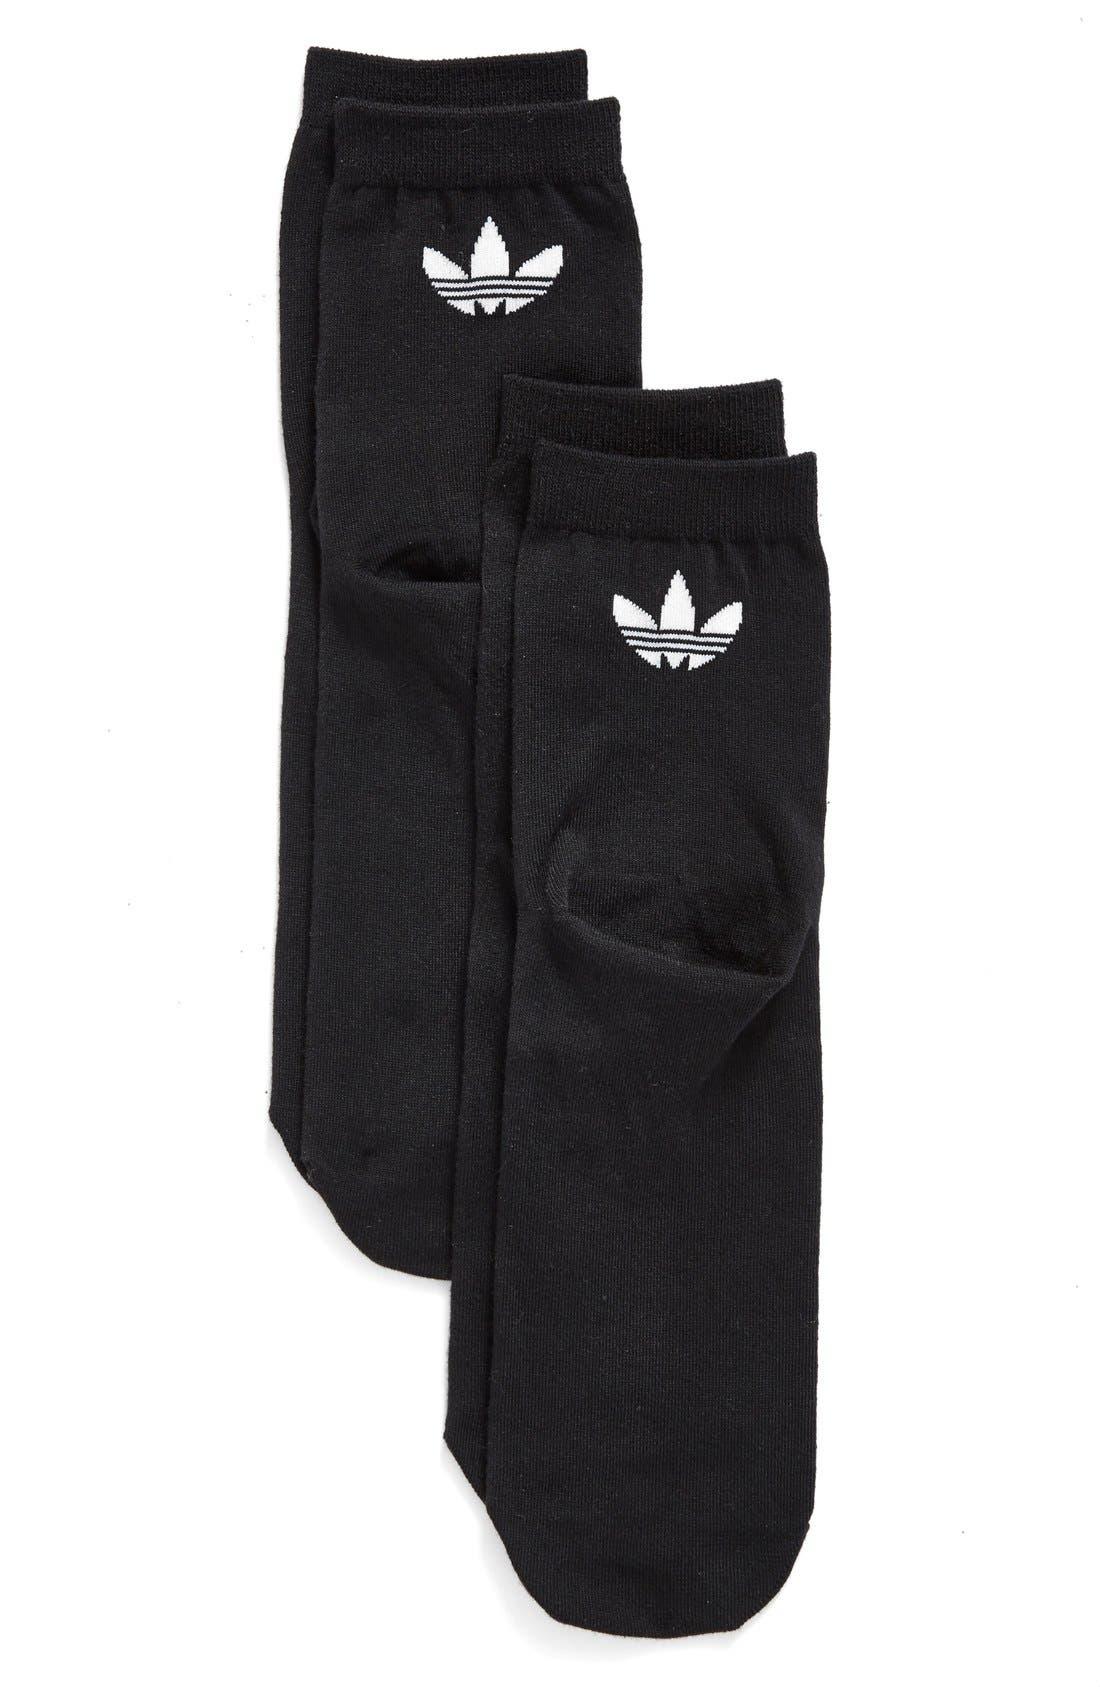 Alternate Image 1 Selected - adidas Trefoil 2-Pack Socks